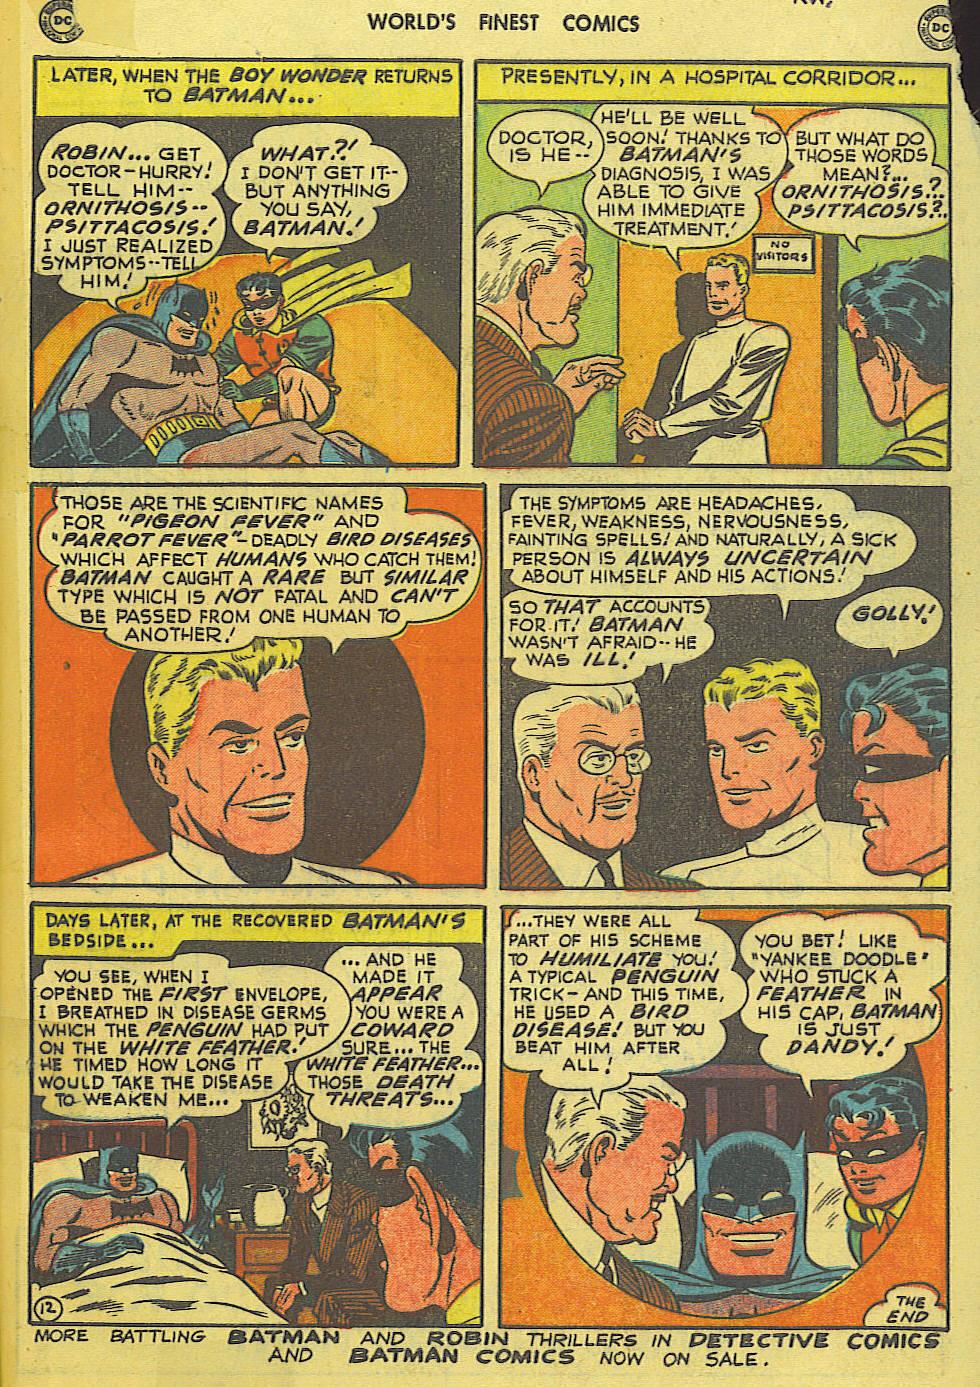 Read online World's Finest Comics comic -  Issue #49 - 74